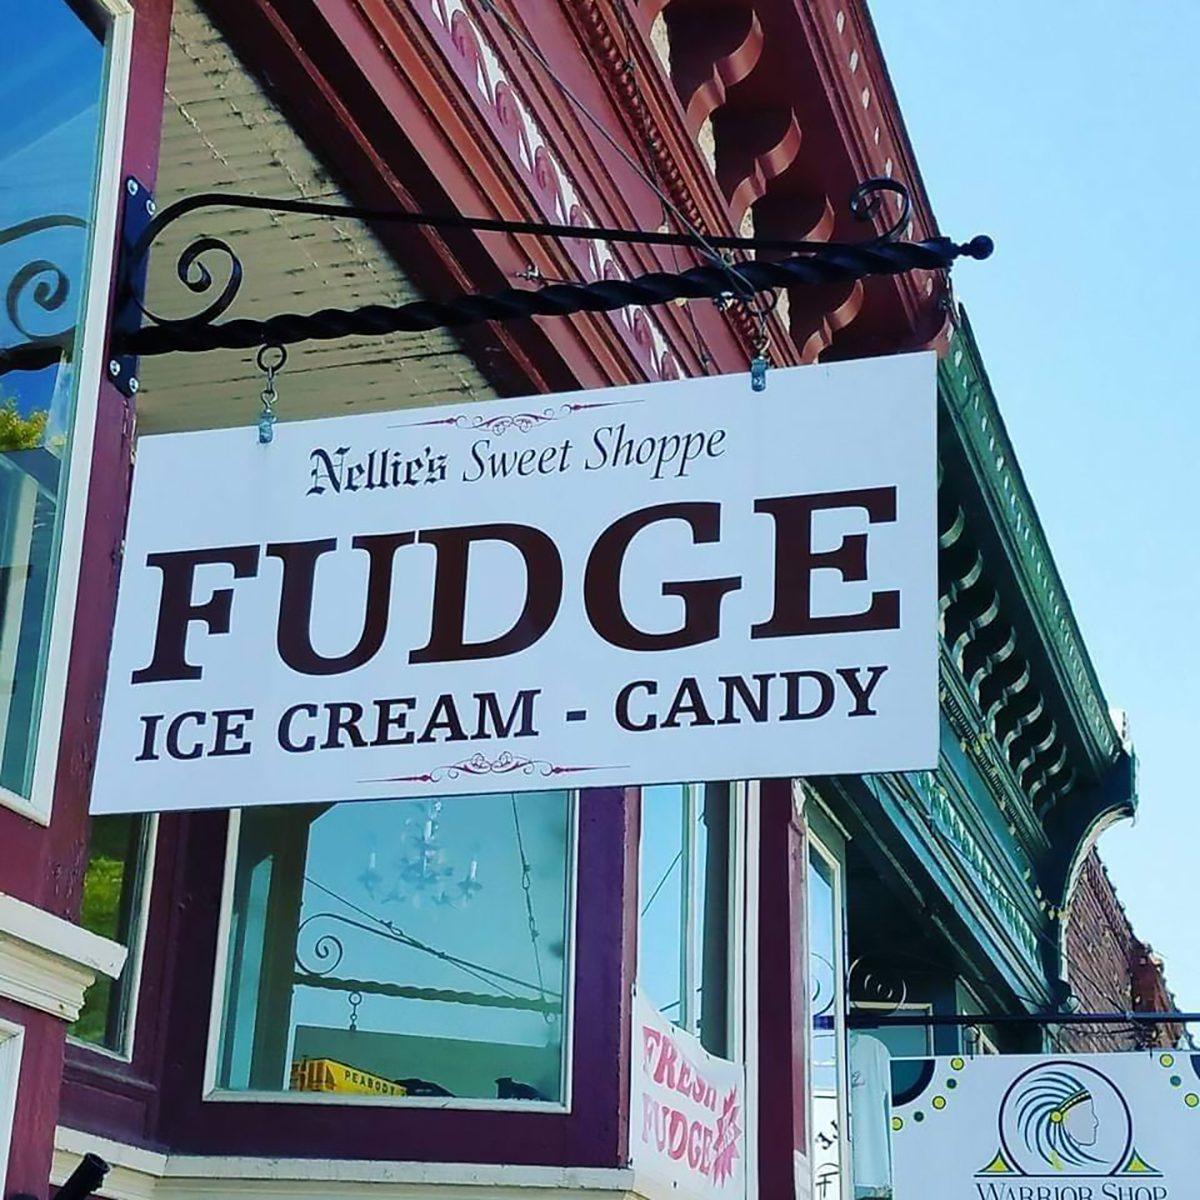 The Best Fudge Shop in Missouri - Nellie's Sweet Shoppe